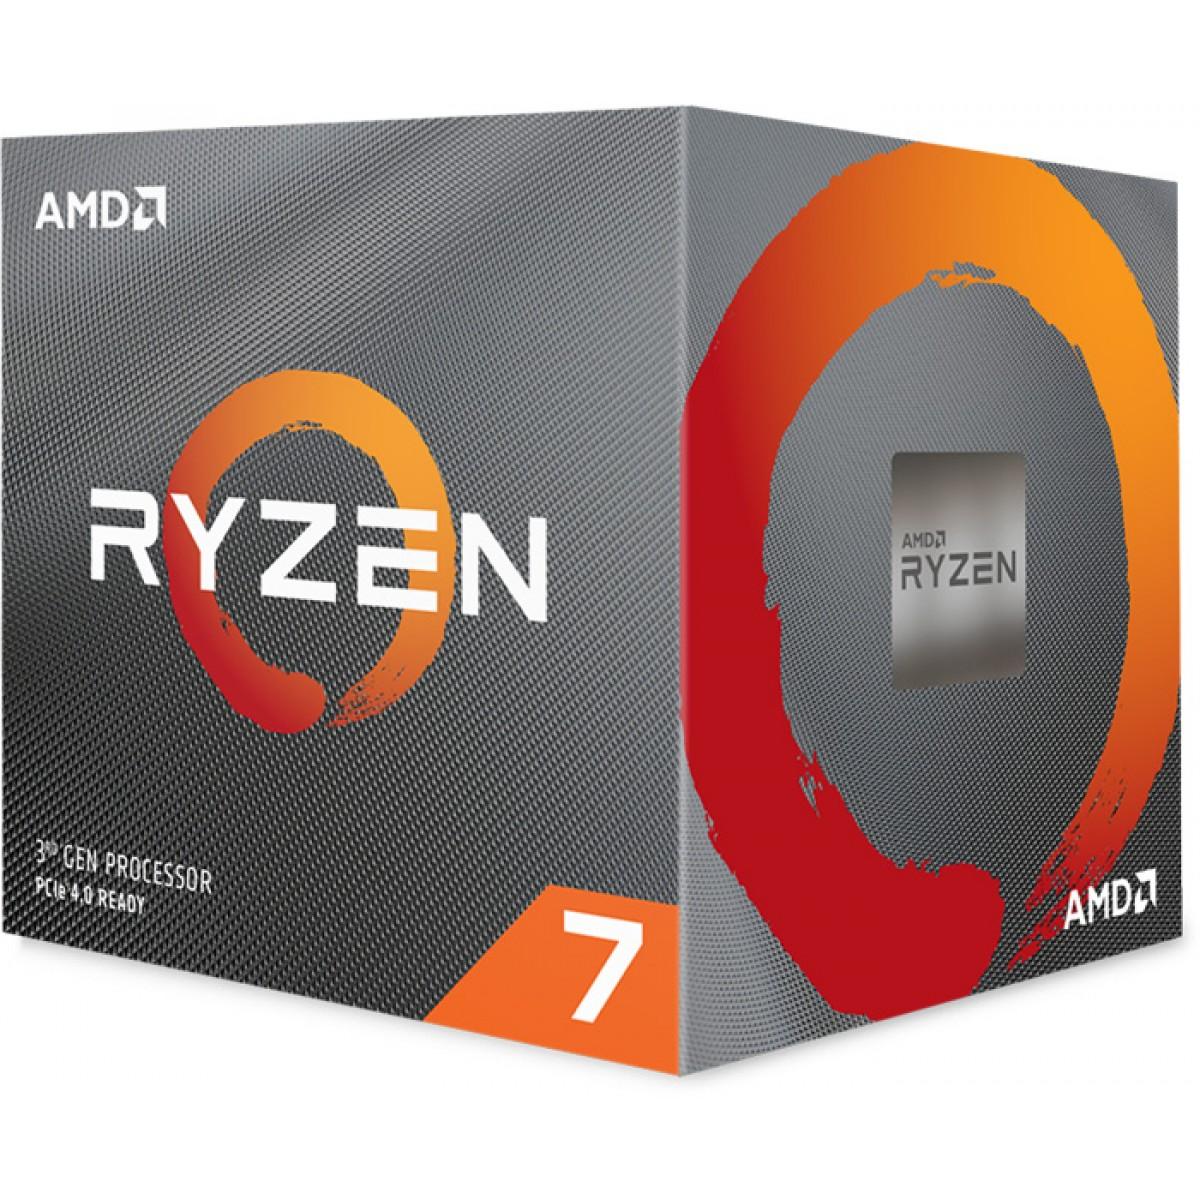 Processador AMD Ryzen 7 3700x 3.6GHz (4.4ghz Turbo), 8-core 16-thread, Cooler Wraith Prism RGB, S/ Video